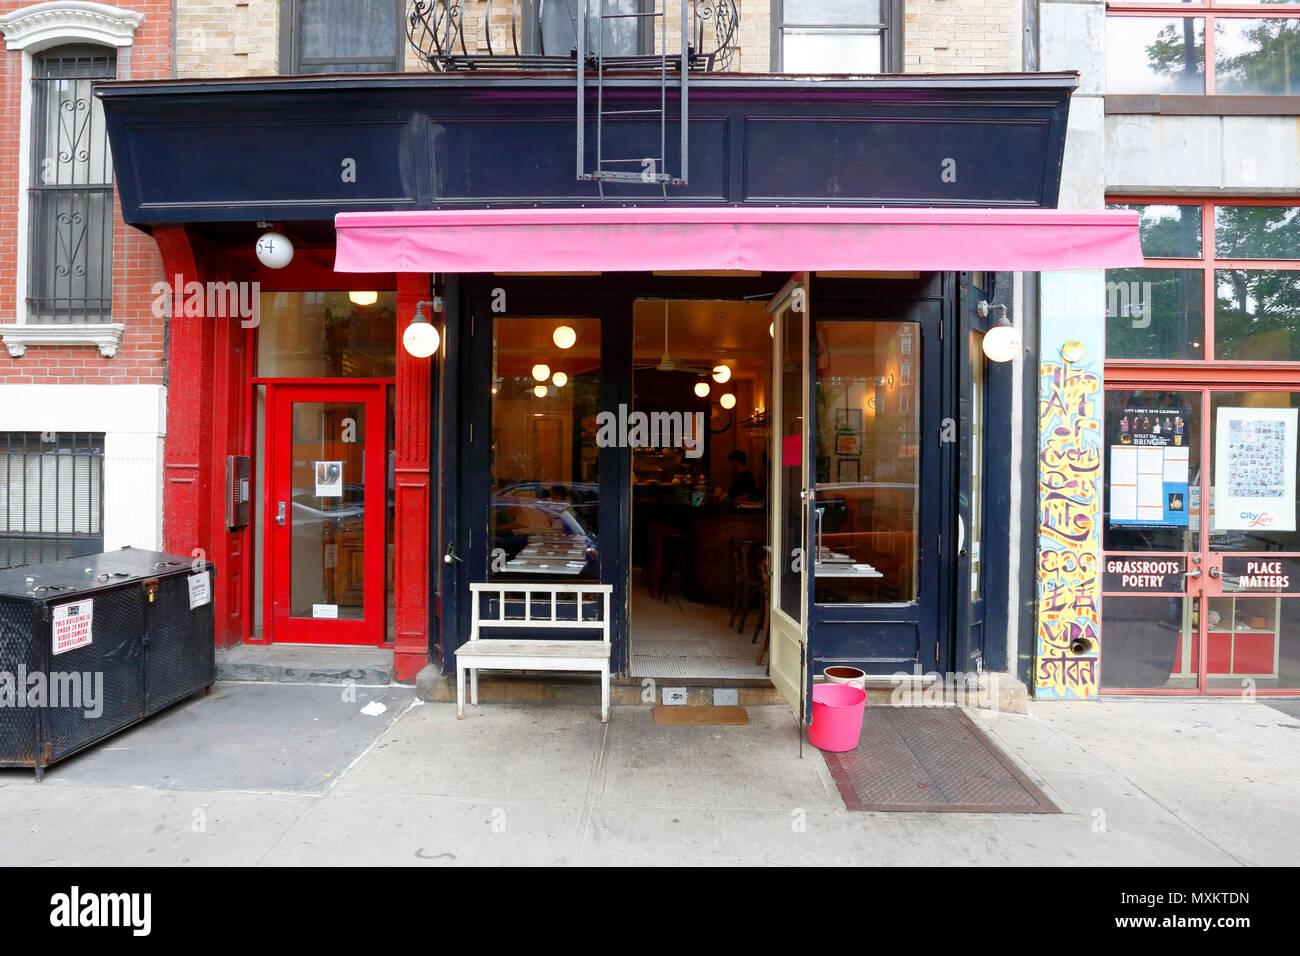 Prune, 54 E 1st St, New York, NY - Stock Image